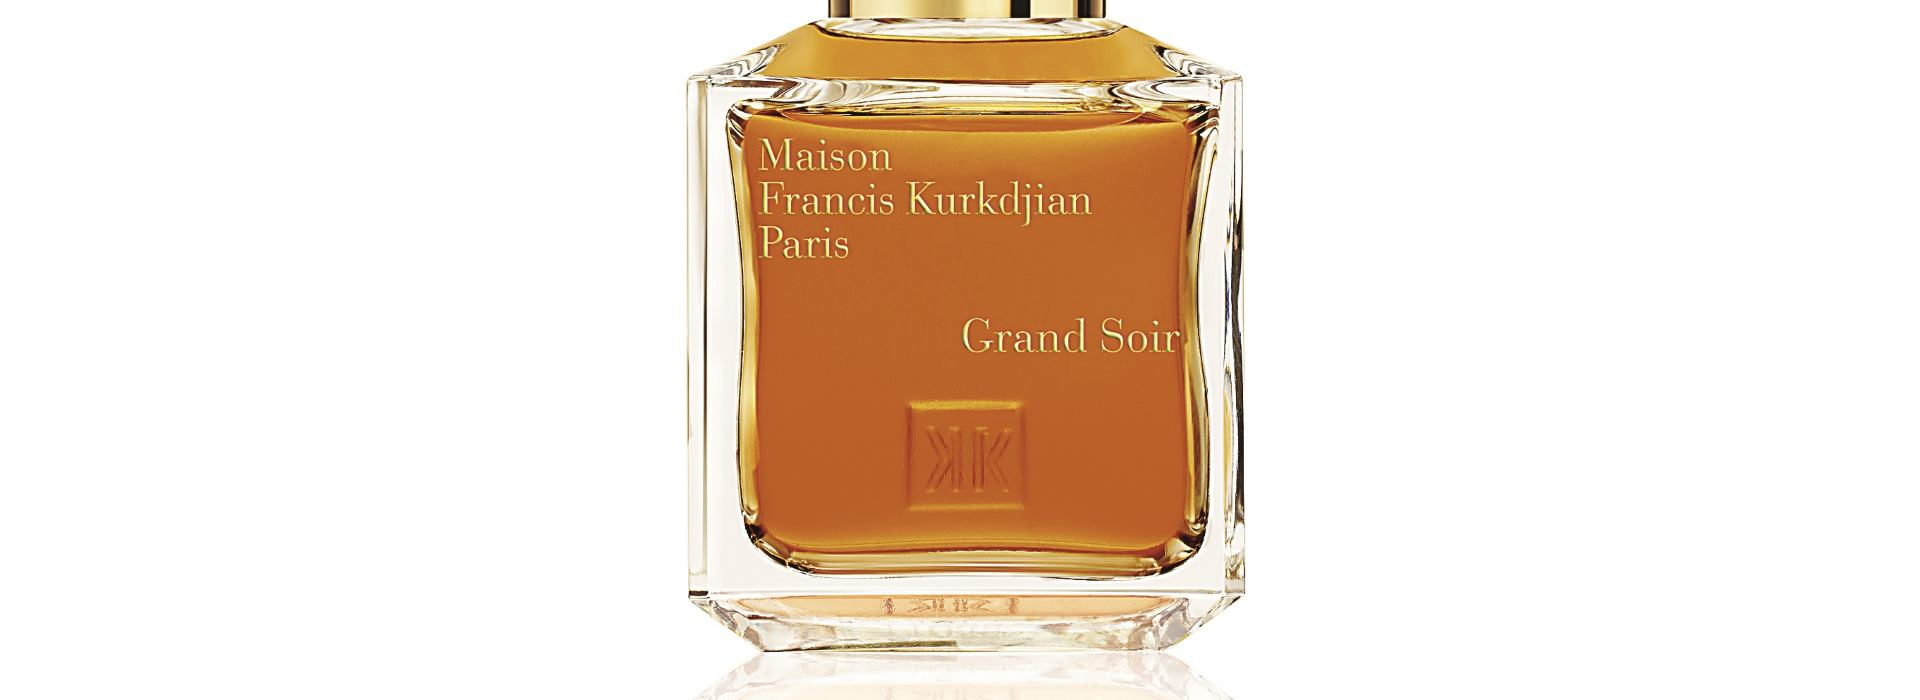 Pariške note novog Kurkdjian parfema